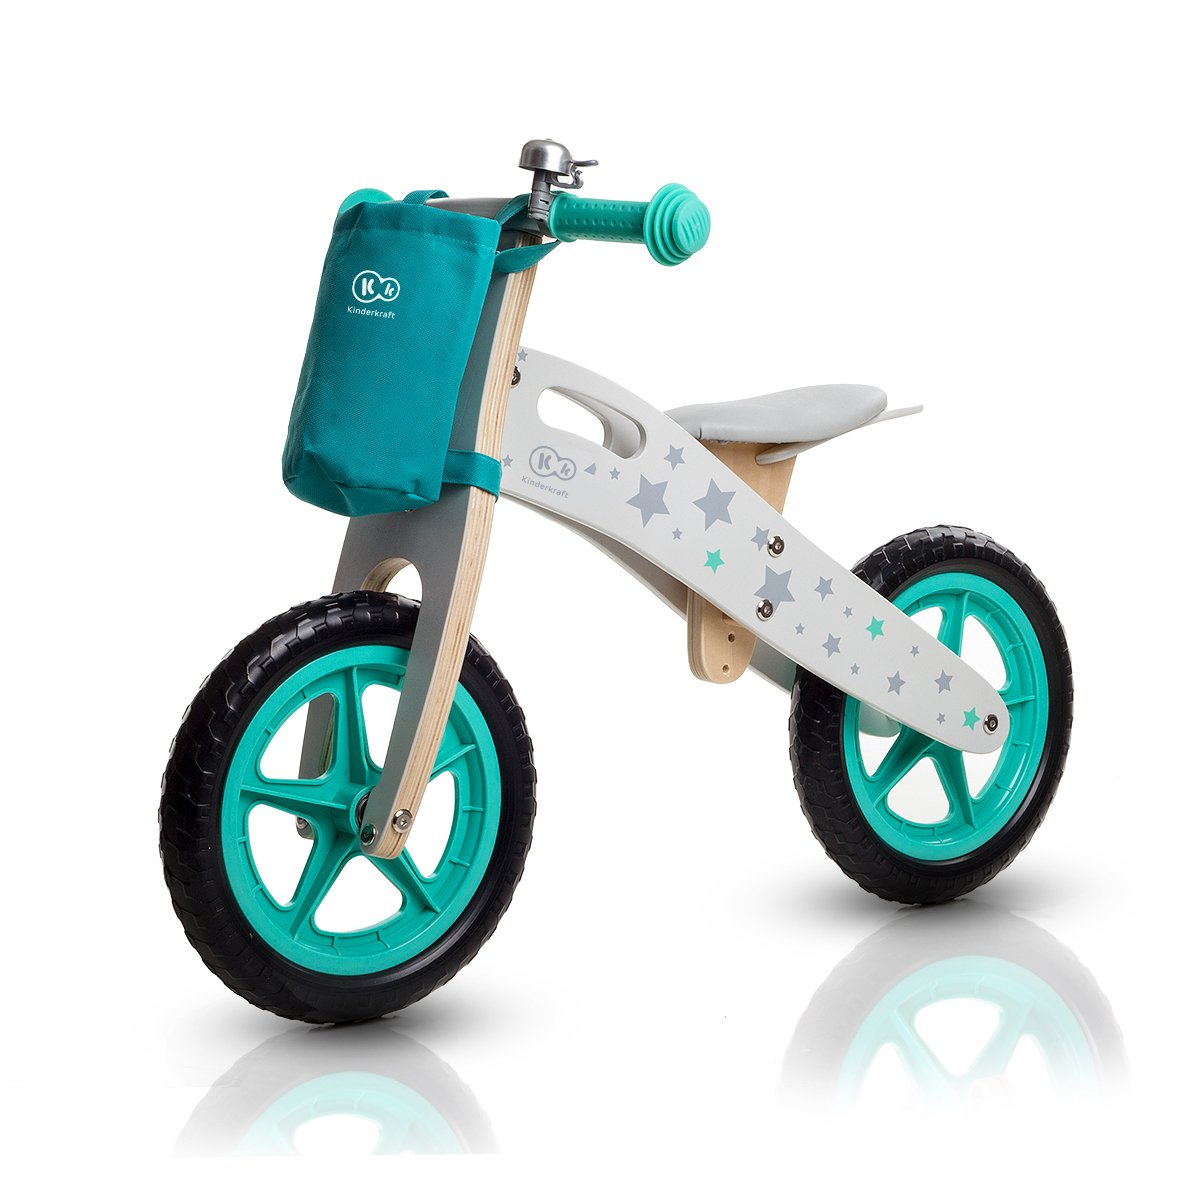 bici-senza-pedali-legno